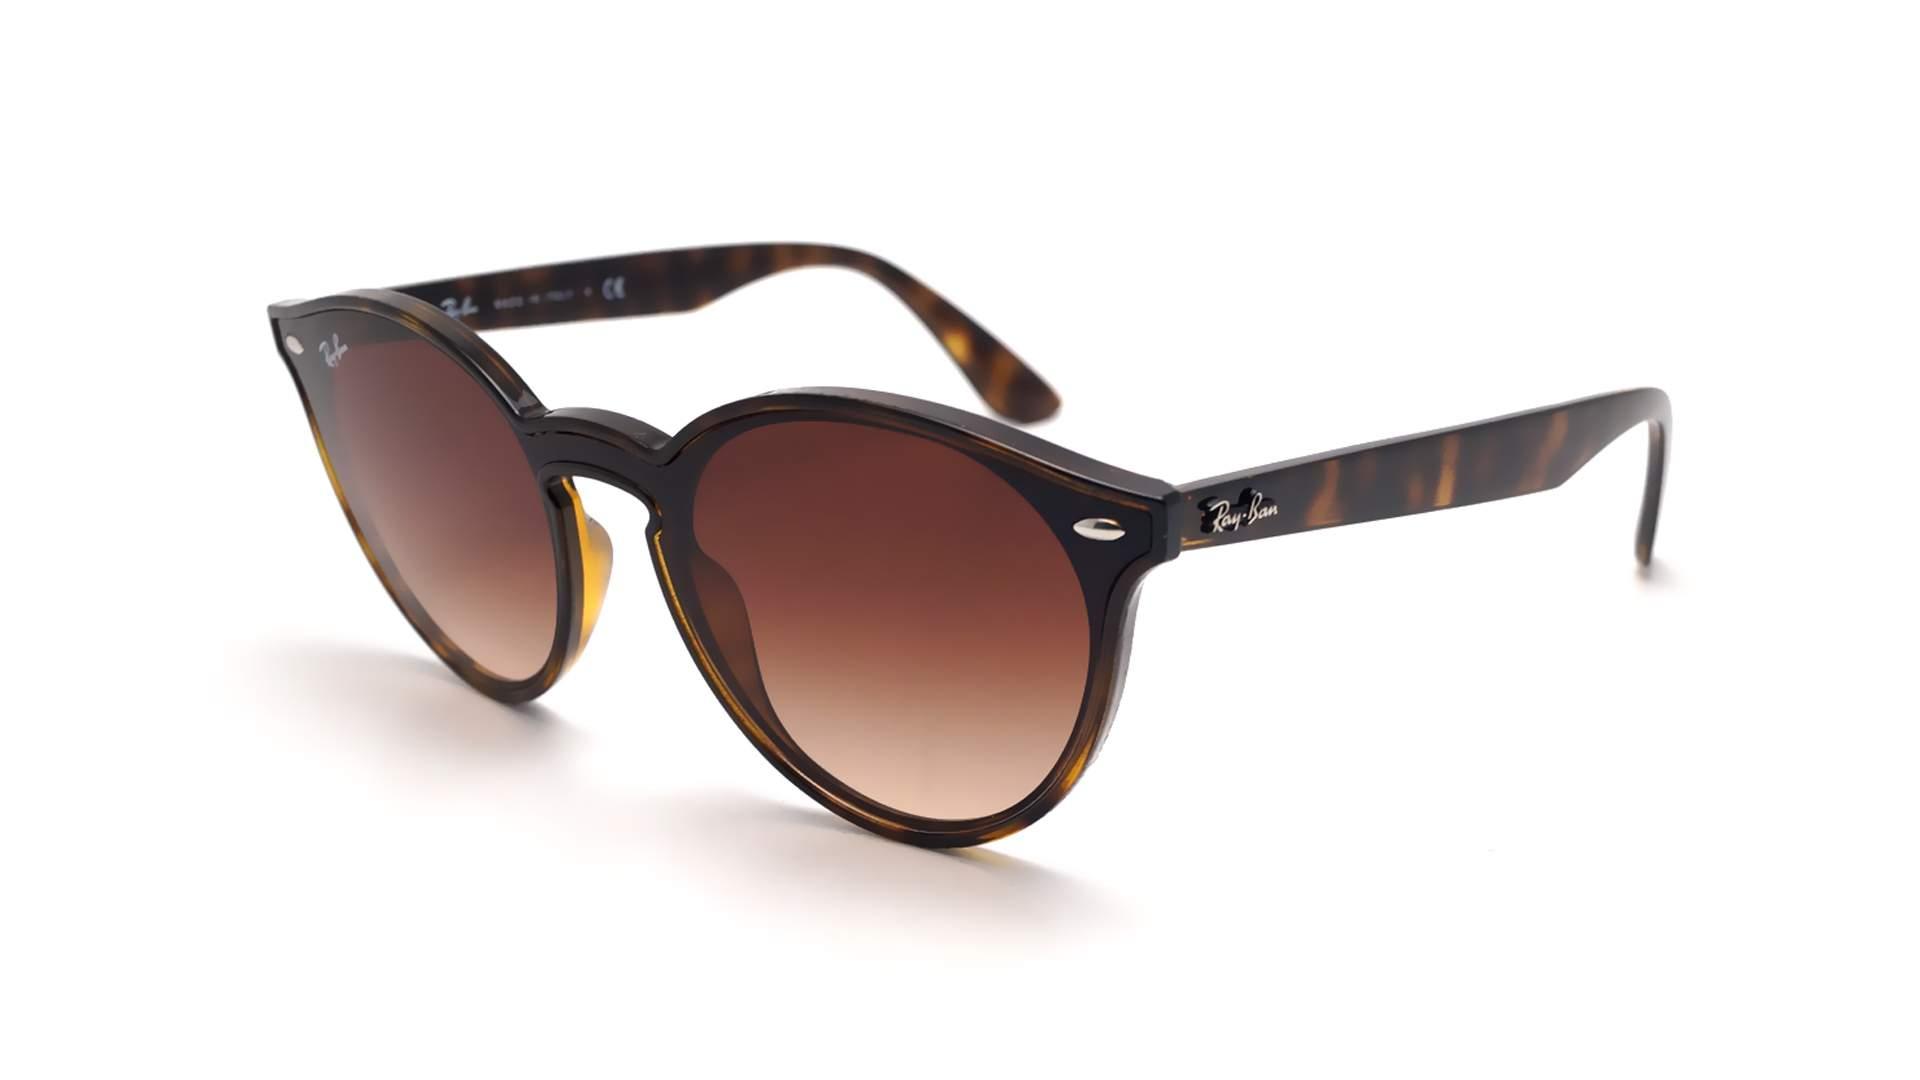 e30df285df Sunglasses Ray-Ban Blaze RB4380N 710 13 37-17 Brown Matte Medium Gradient